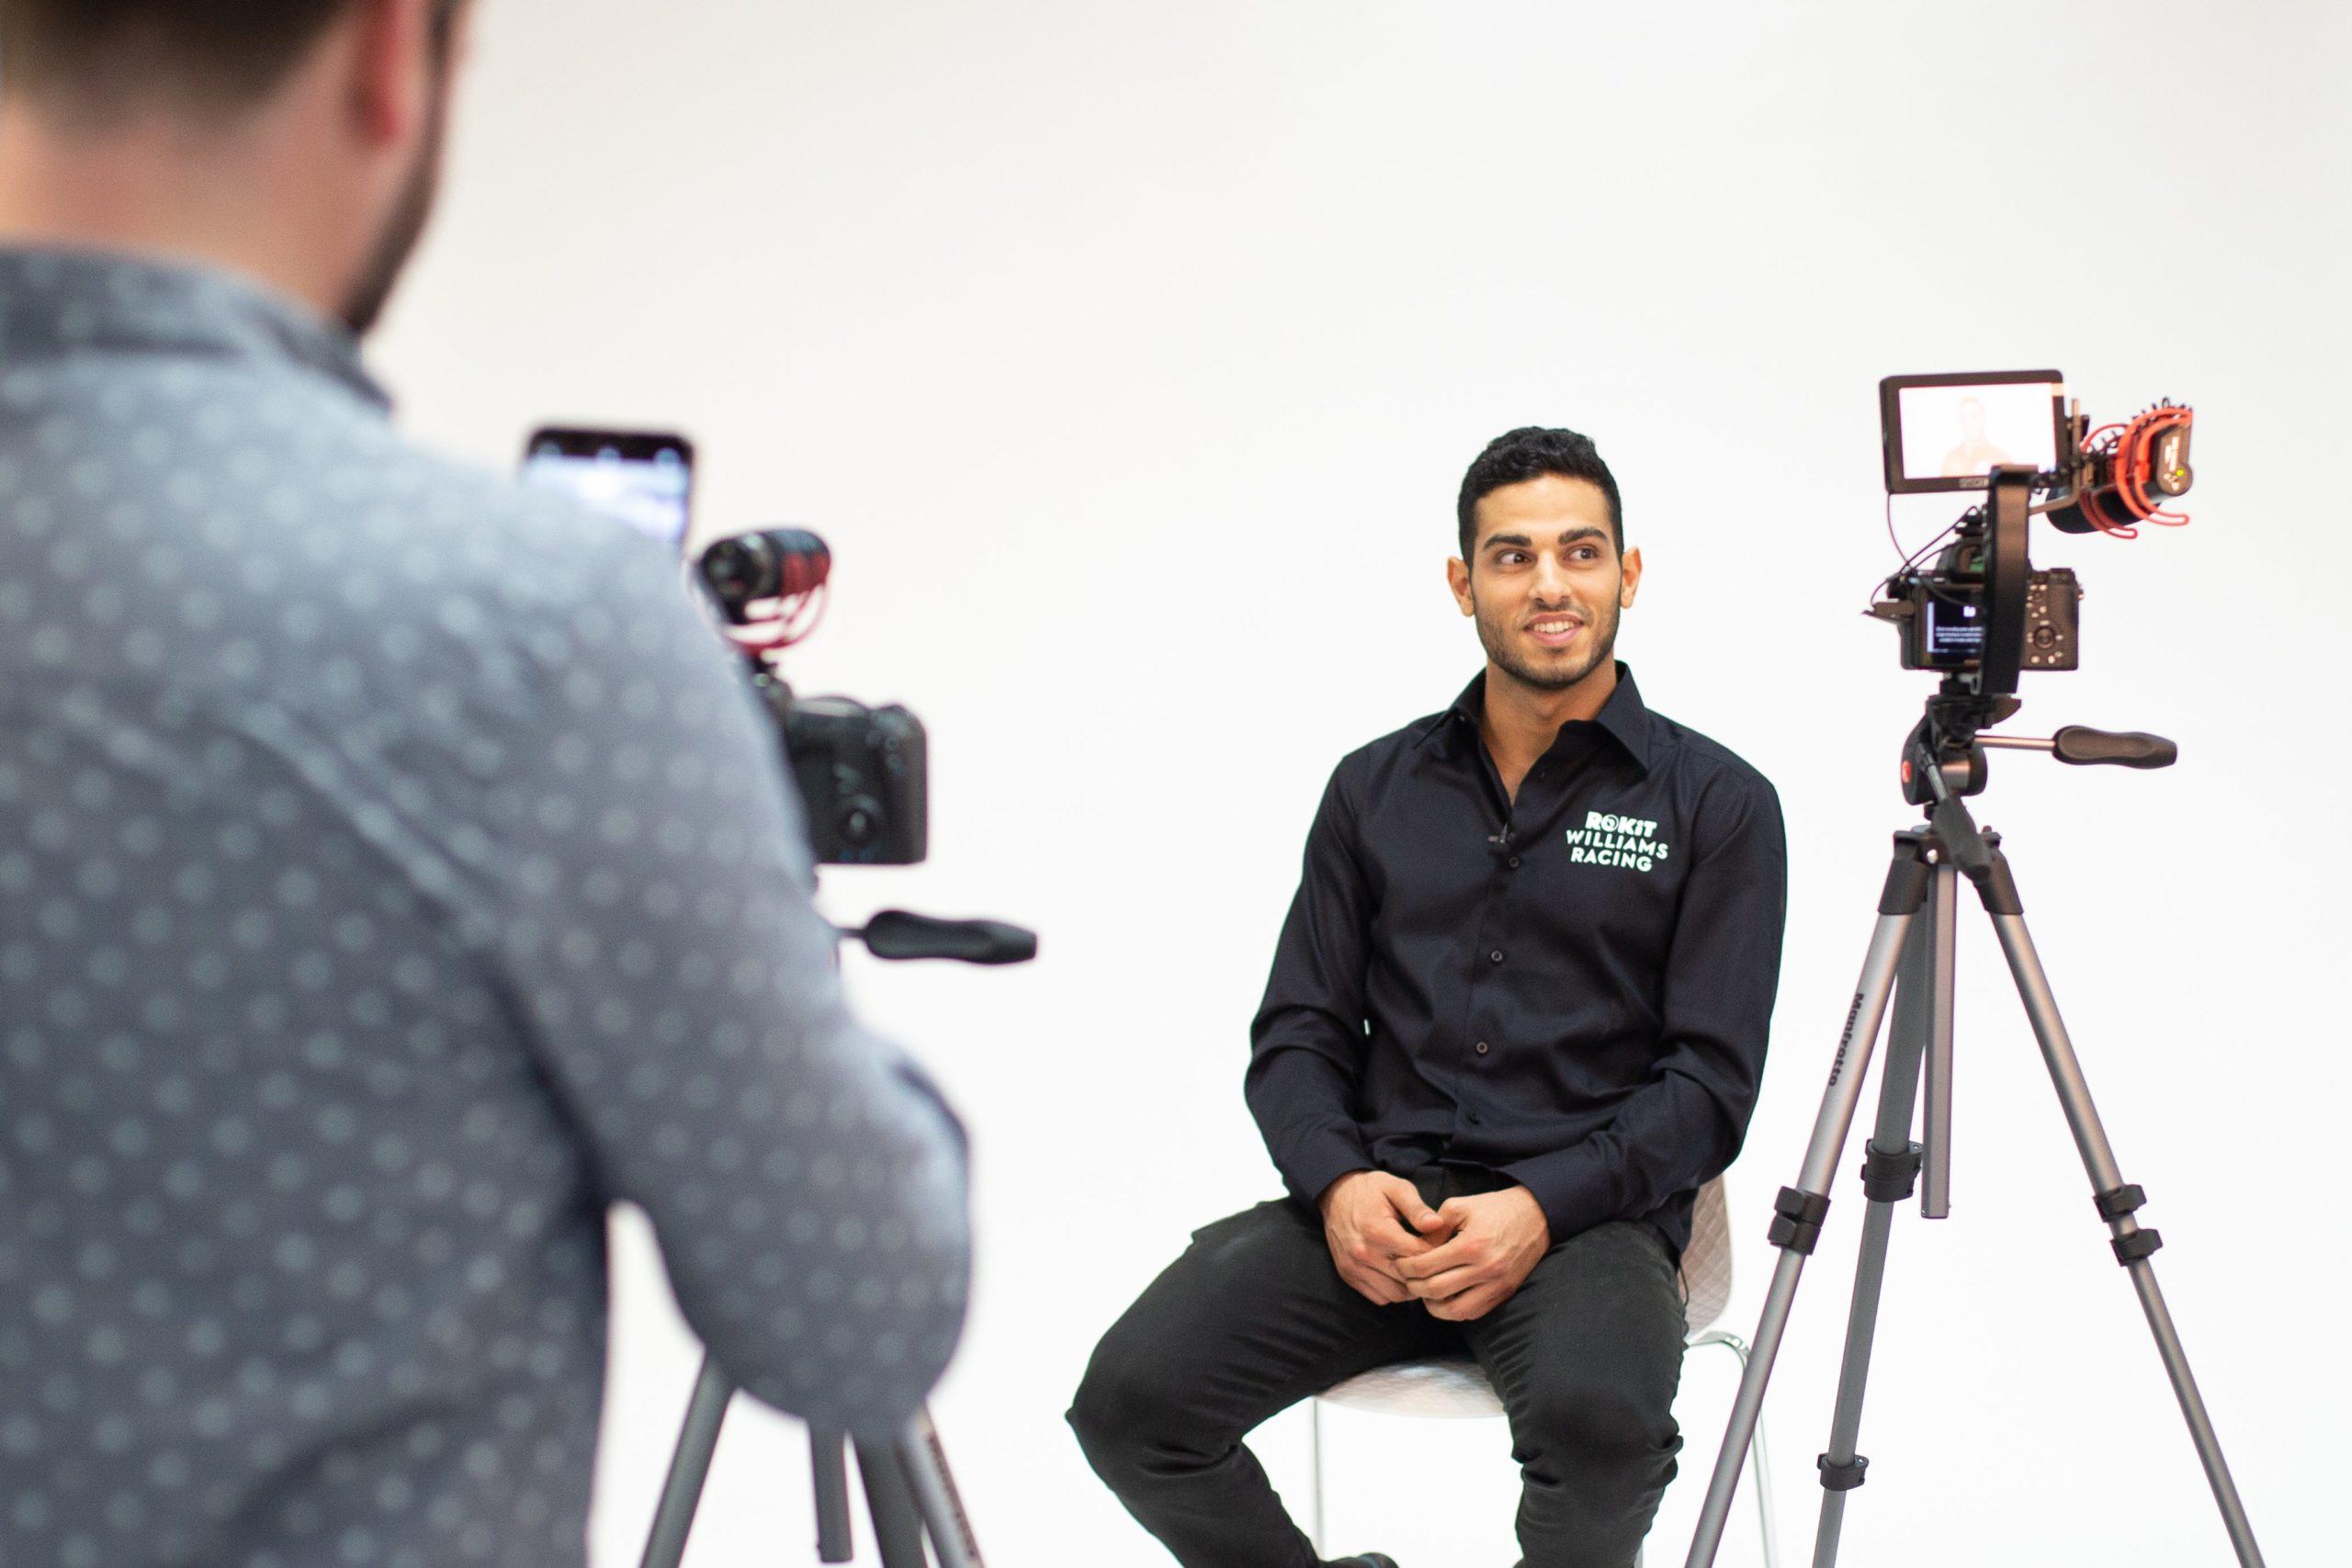 Un israeliano in Formula 1: tutto il suo Paese spinge Roy Nissany